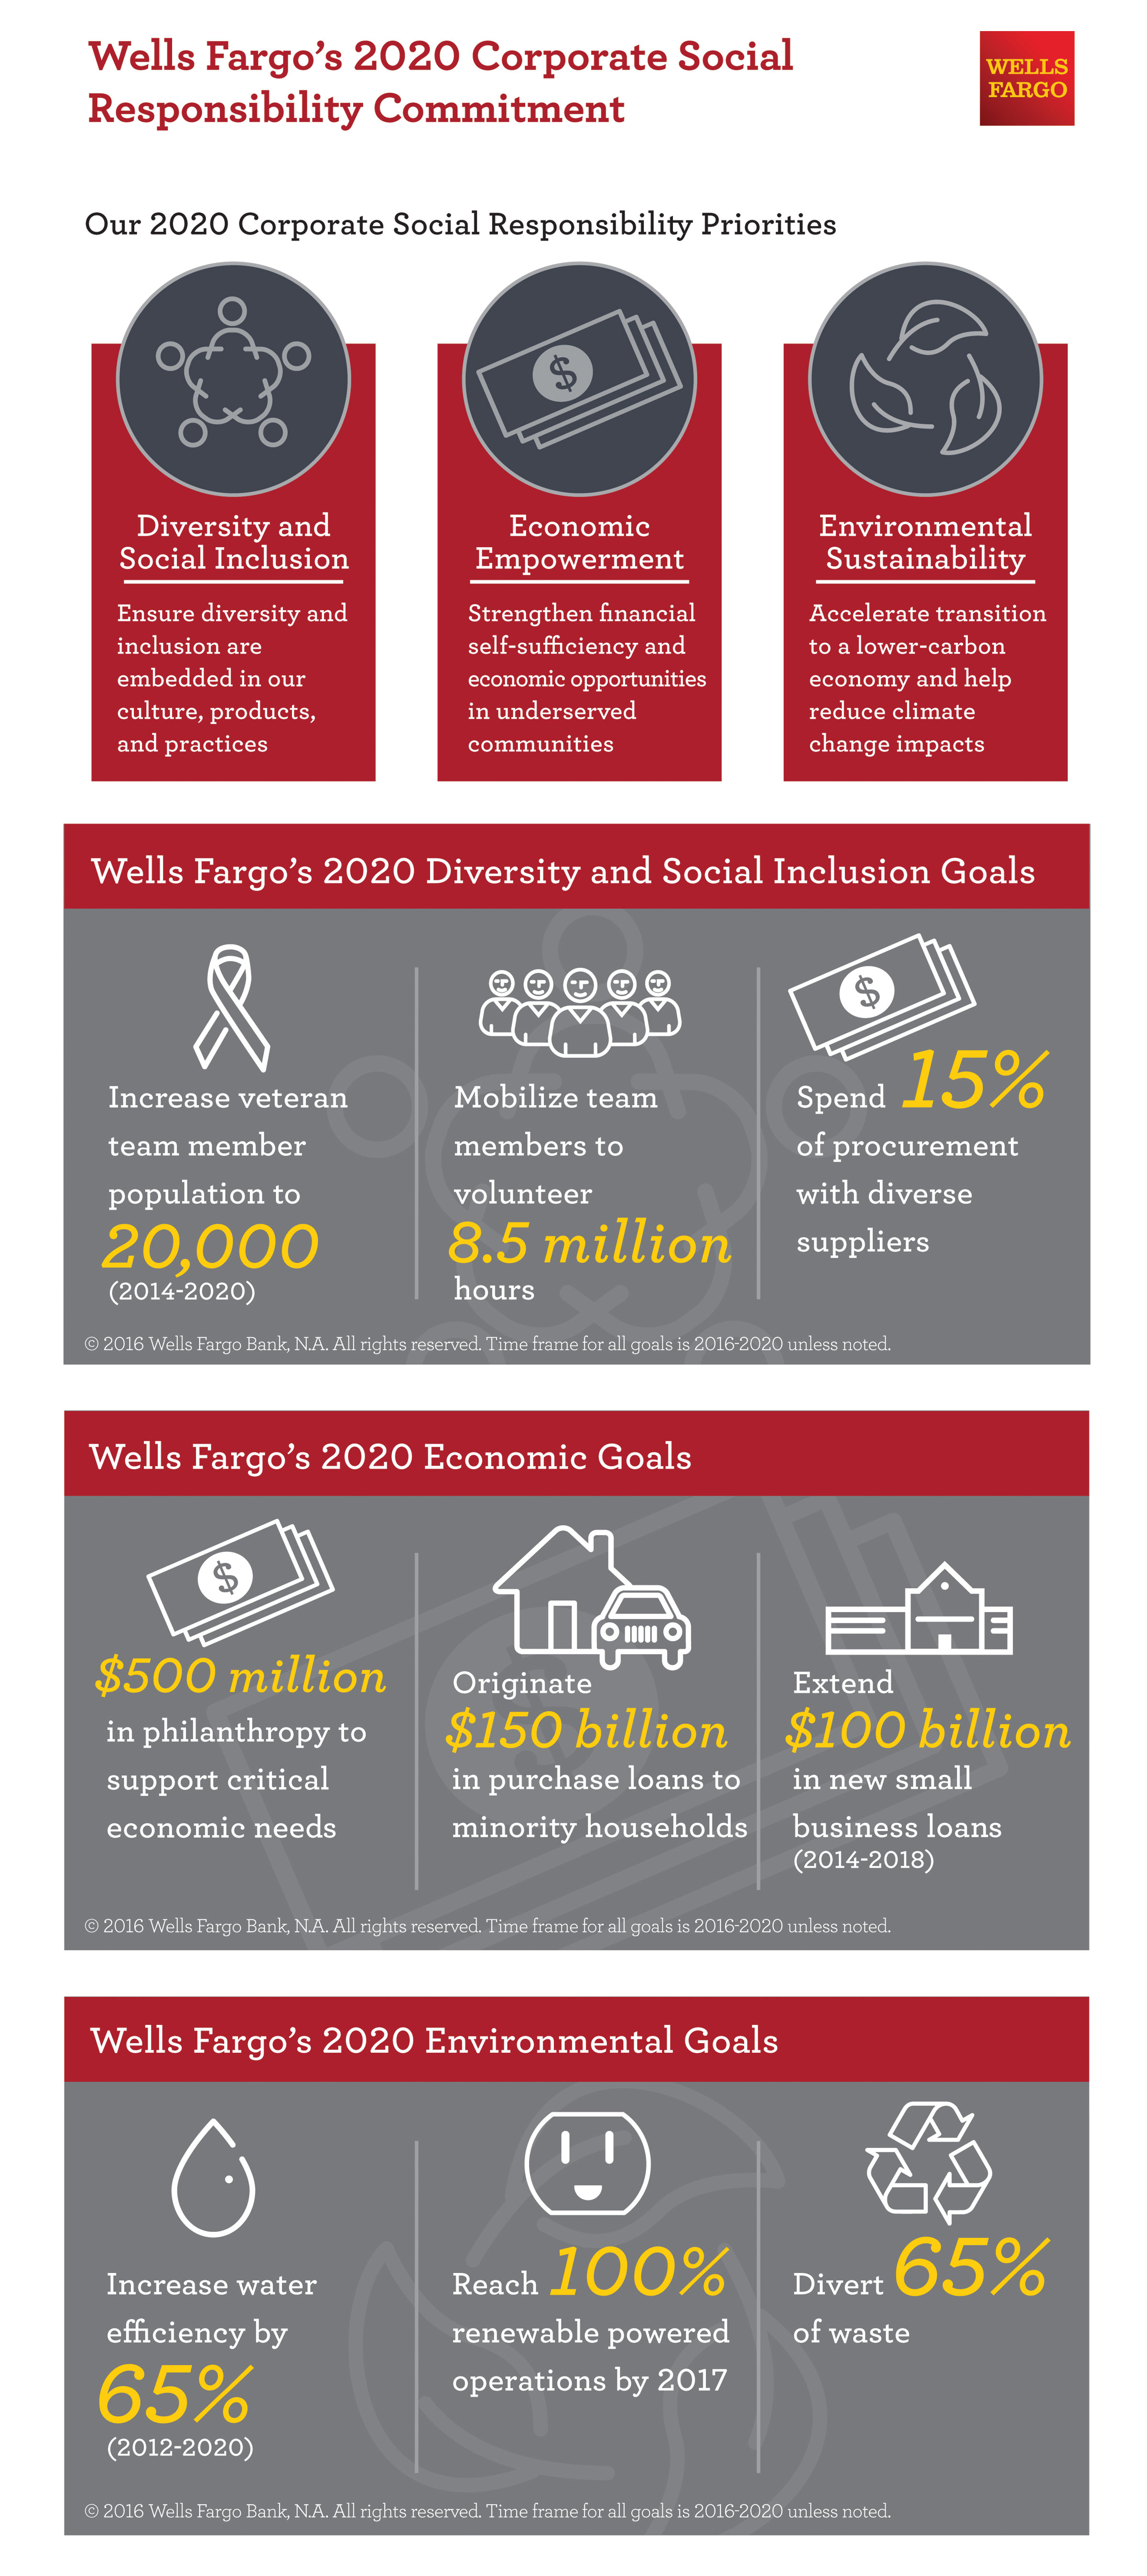 Wells Fargo Business Wiring Instructions : Wells fargo unveils five year corporate social